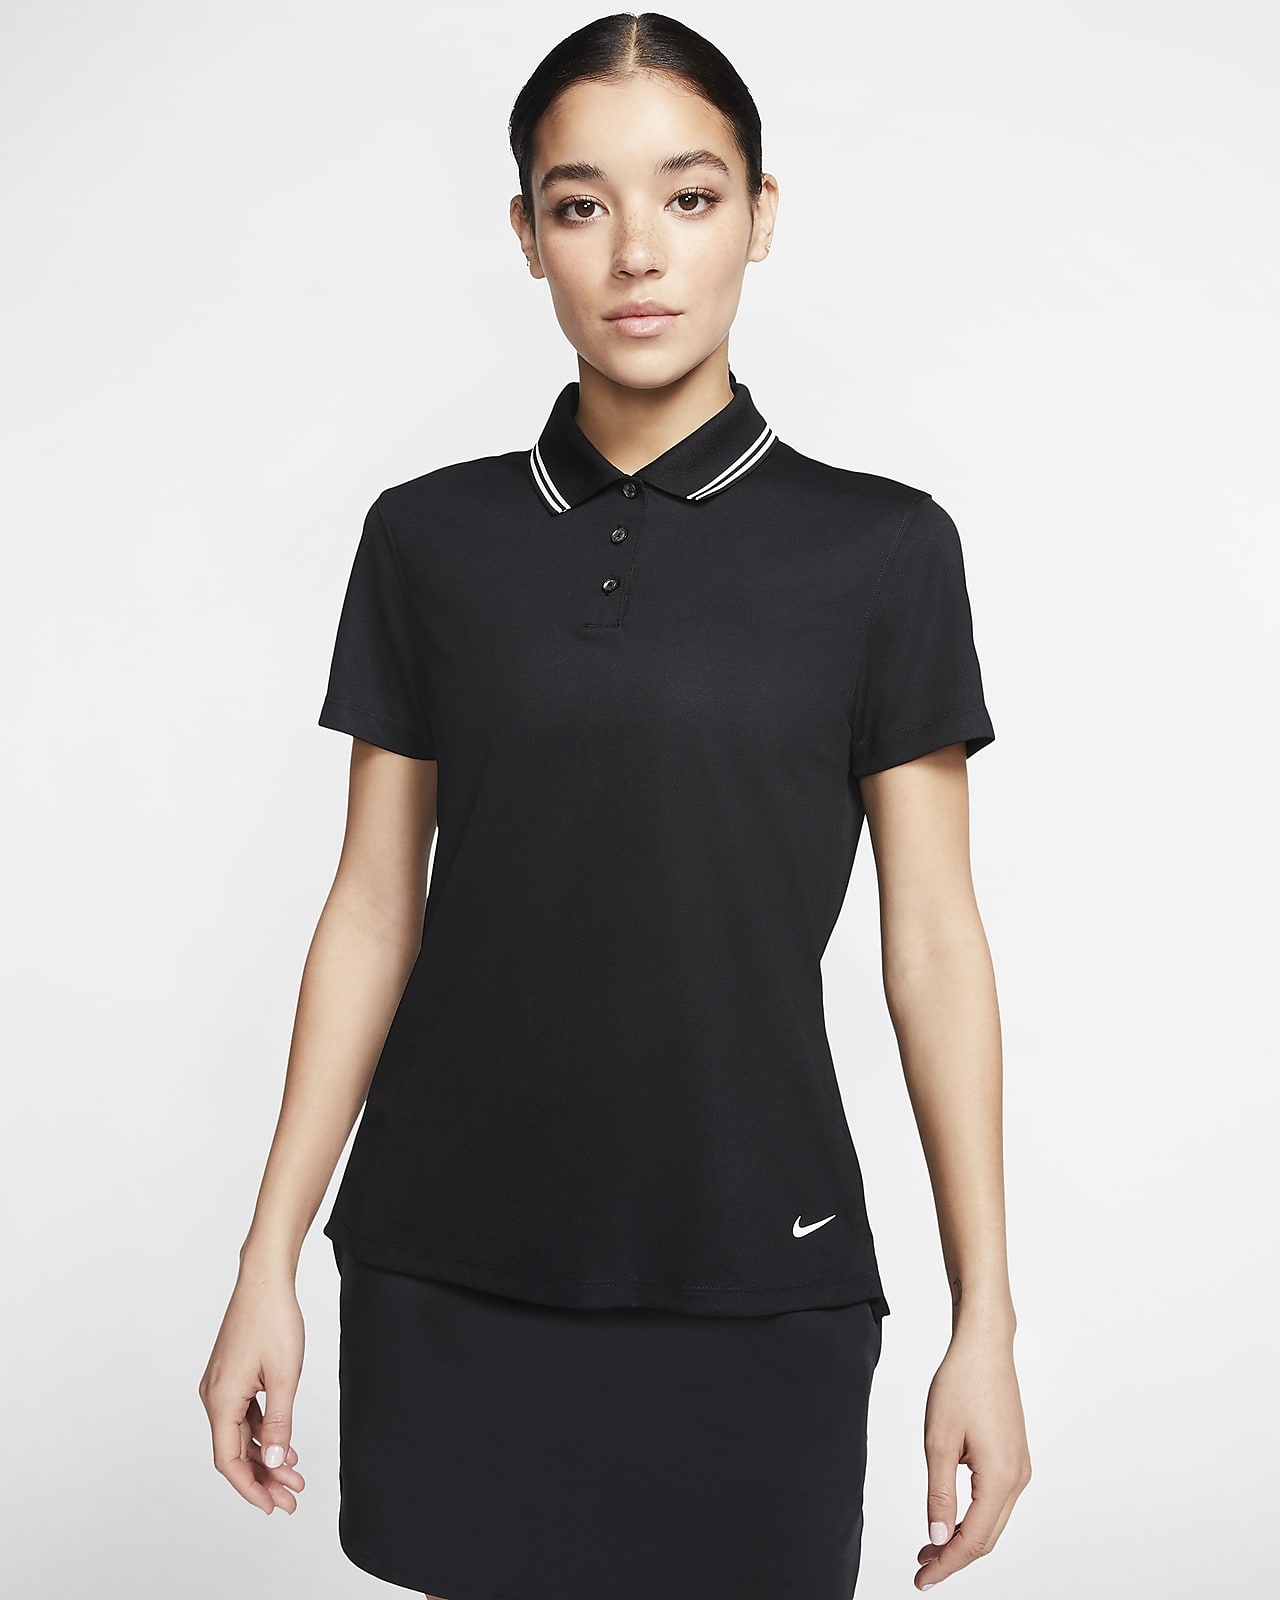 Polo de golf para mujer Nike Dri-FIT Victory